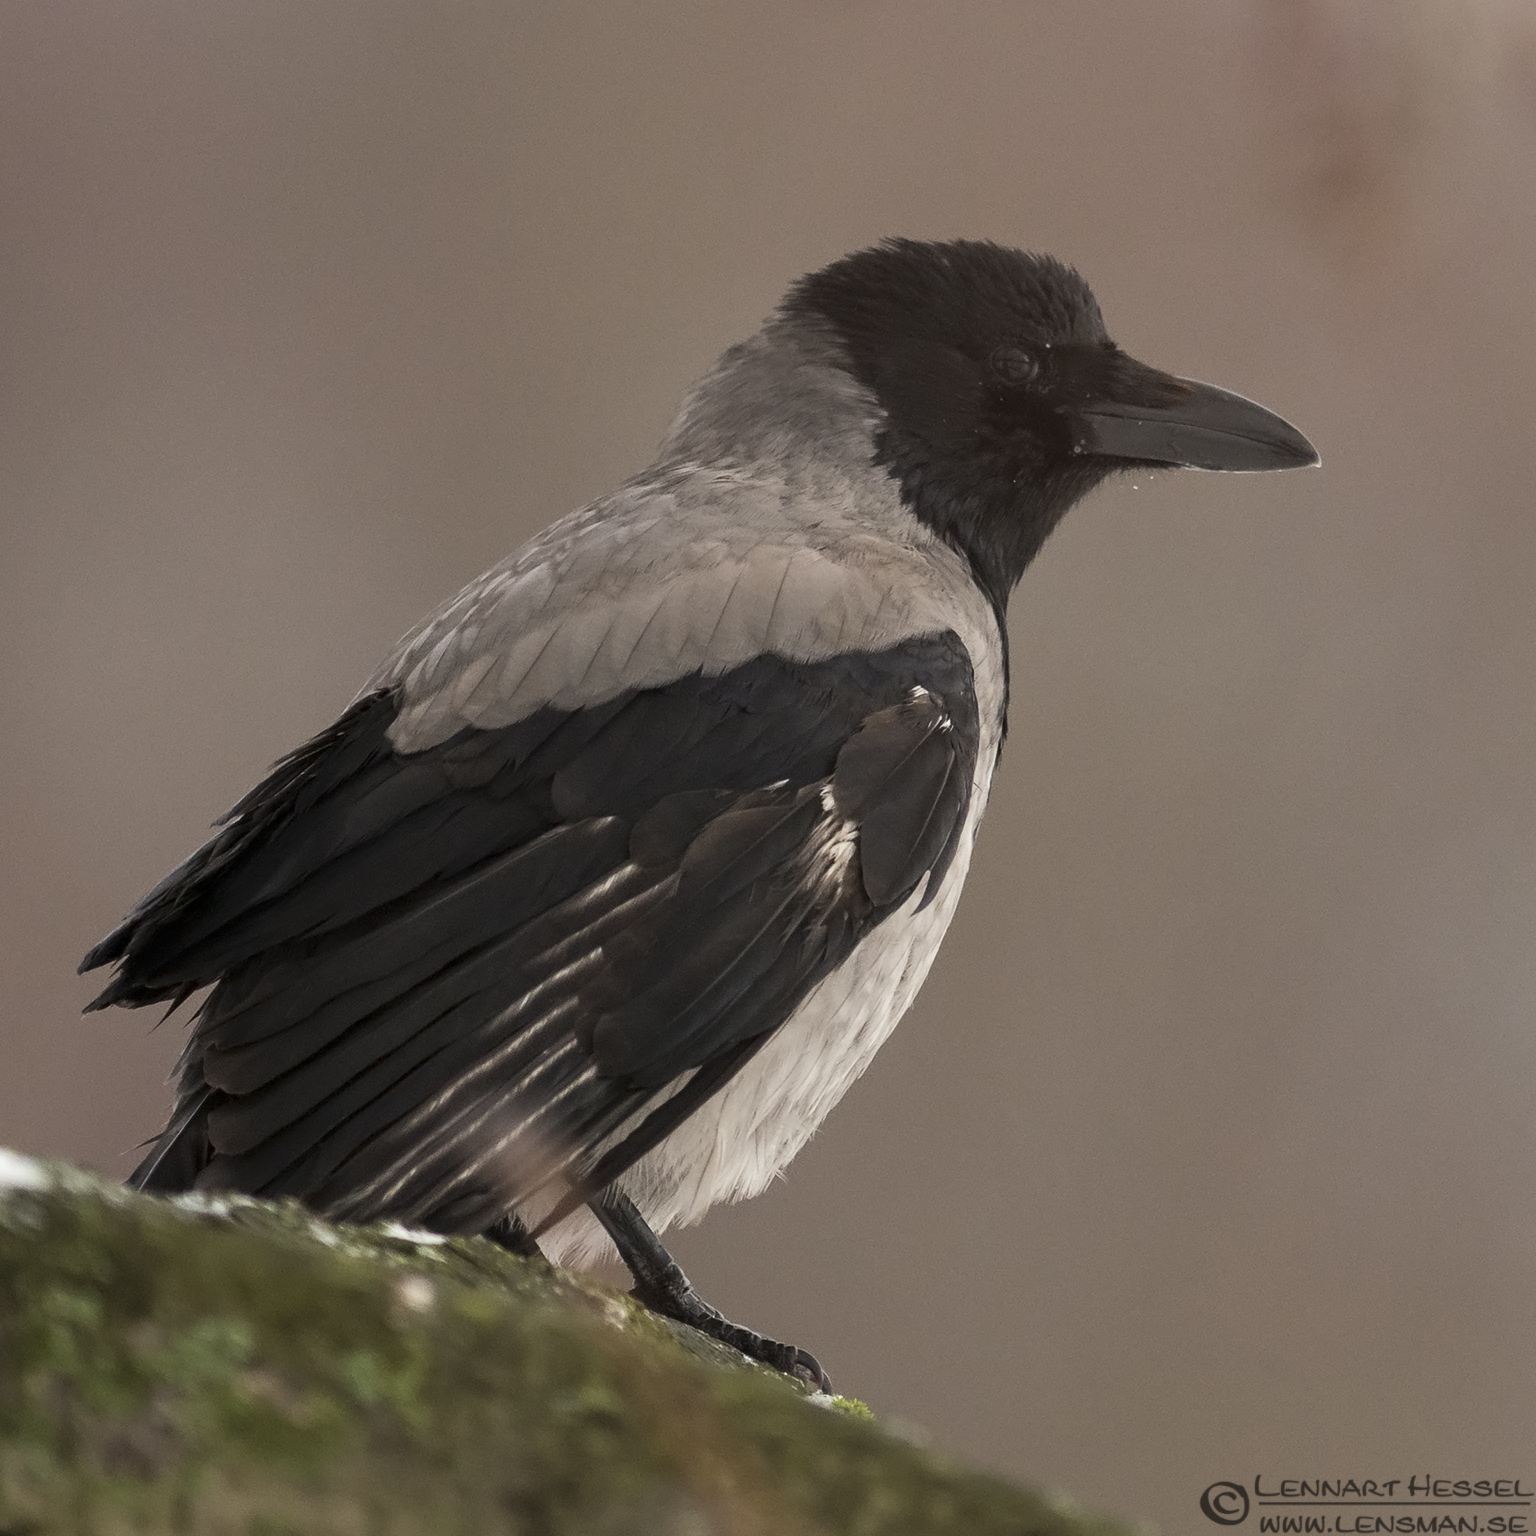 Hooded Crow photo from Slottskogen on Christmas Eve